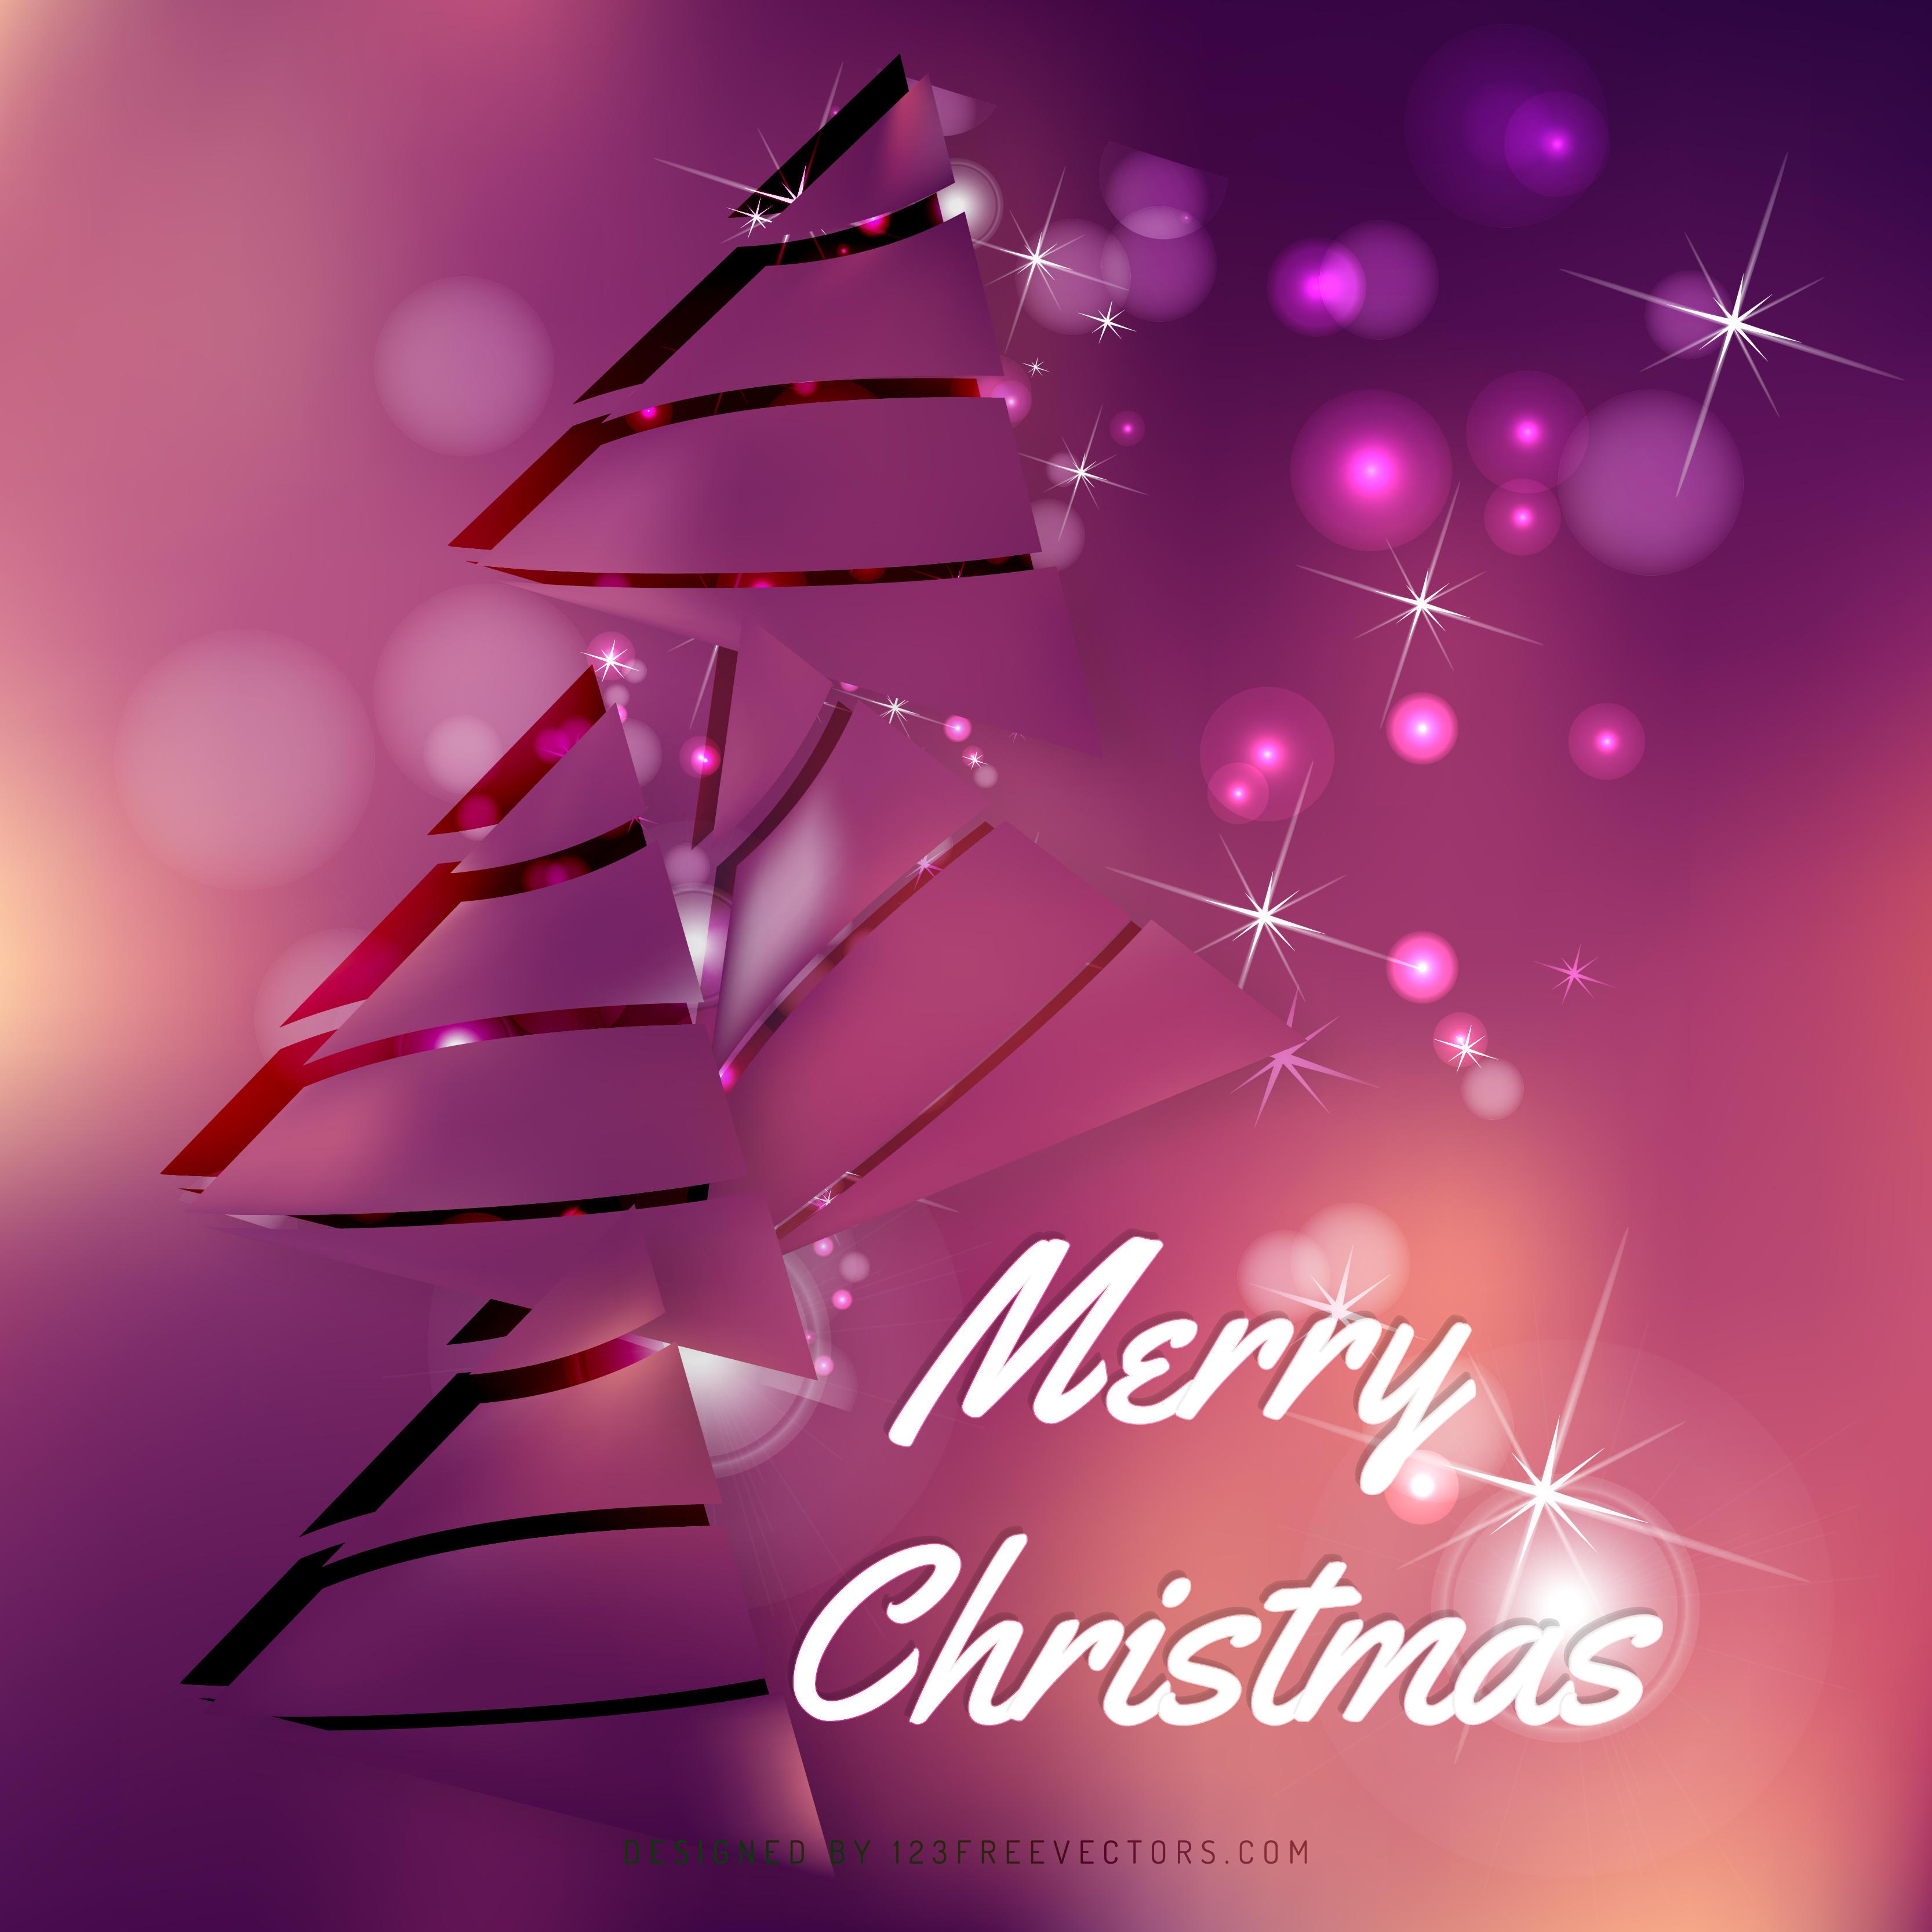 Pink Christmas Tree Background Image